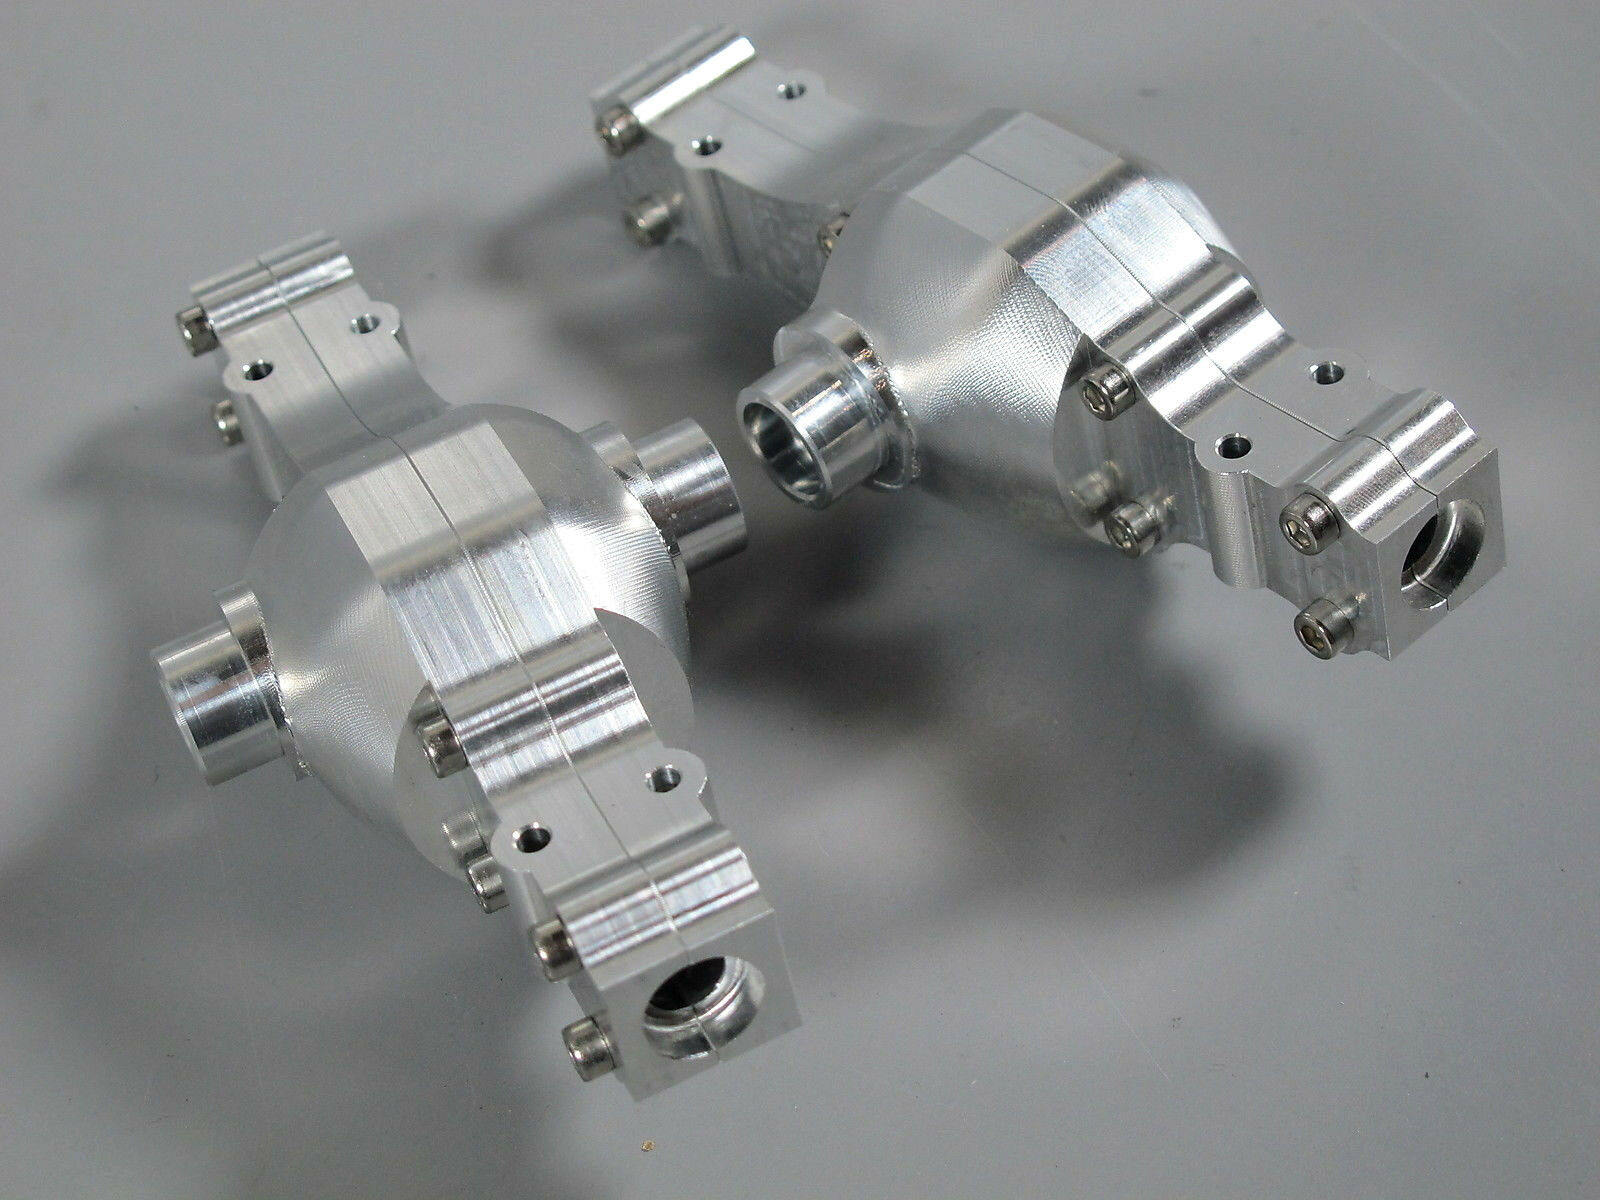 Eje de Aluminio Diff vivienda cubierta Tamiya R C 1 14 King Grand KNIGHT HAULER Scania